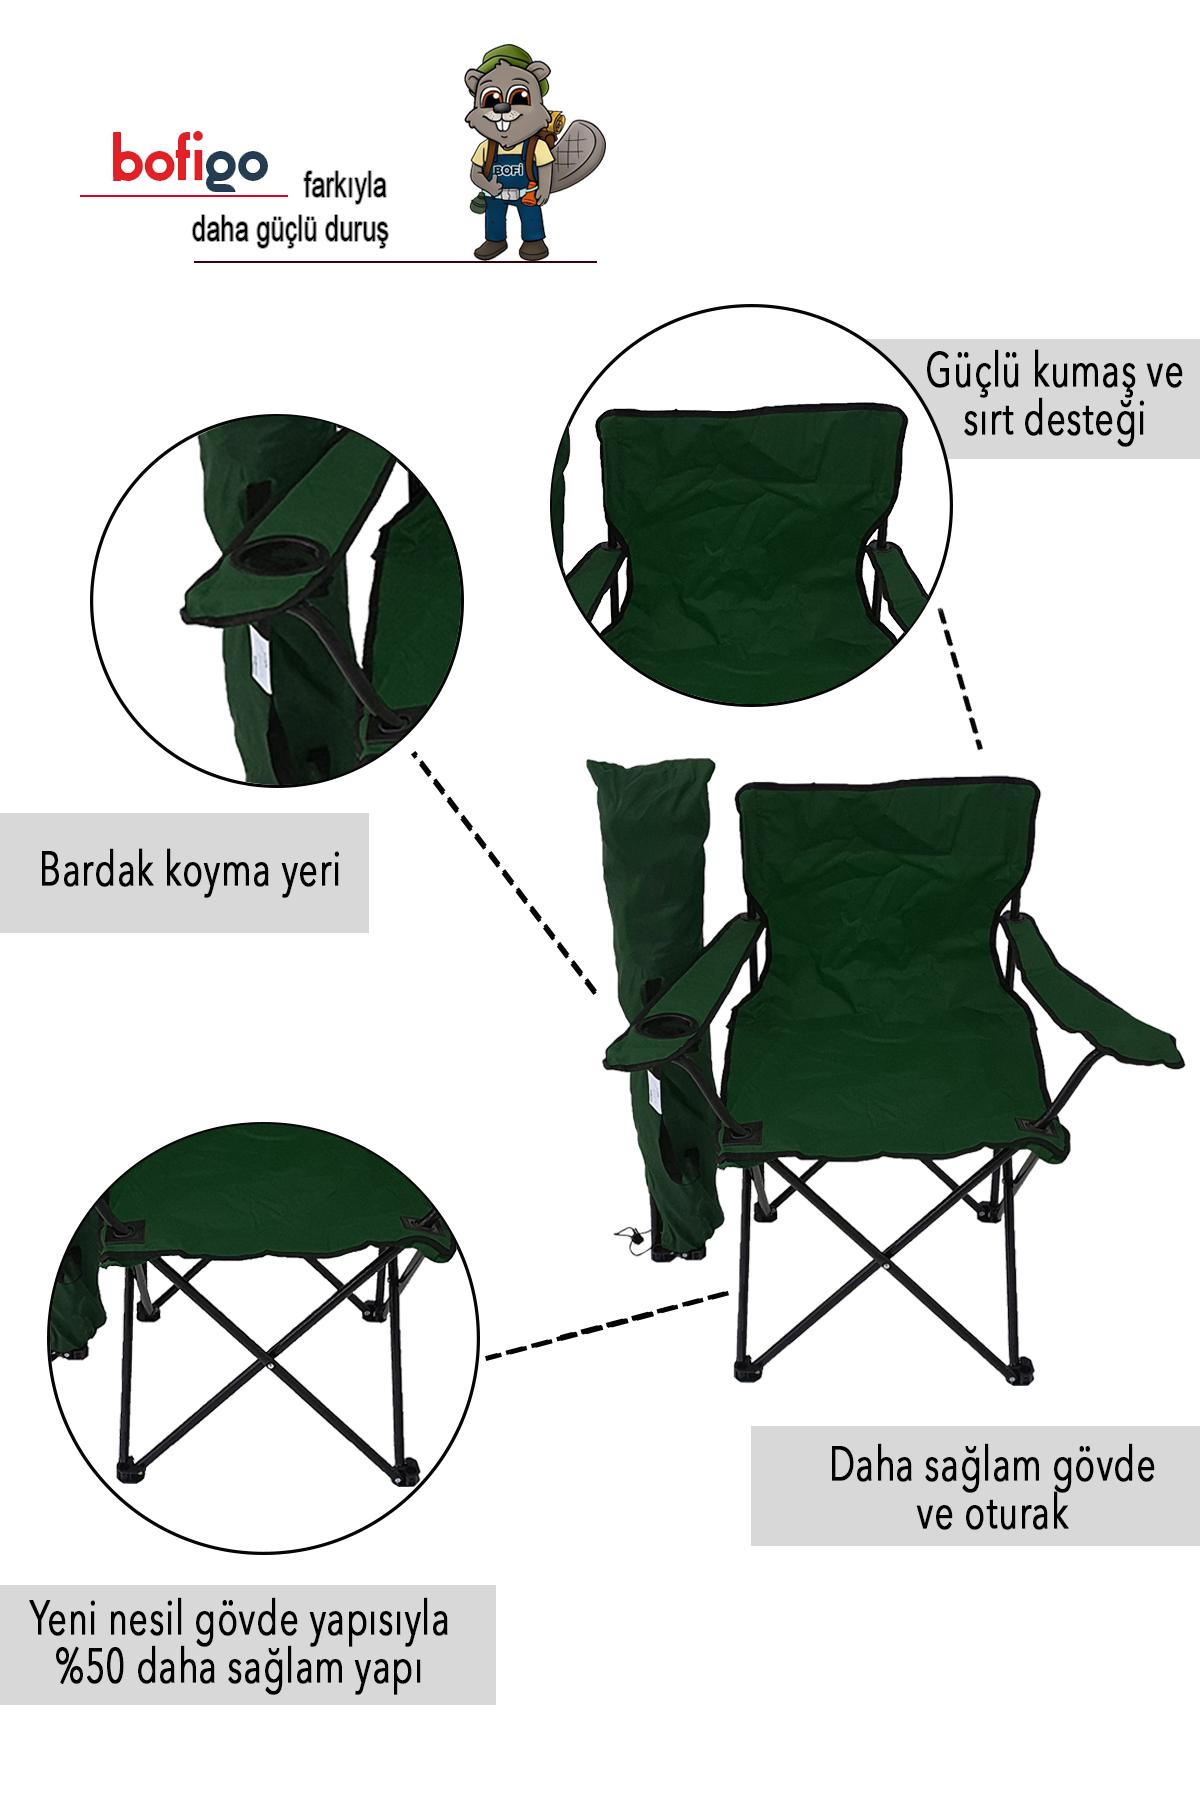 Bofigo 3-Seat Camping Chair Picnic Chair Folding Chair Camping Chair with Carrying Bag Green